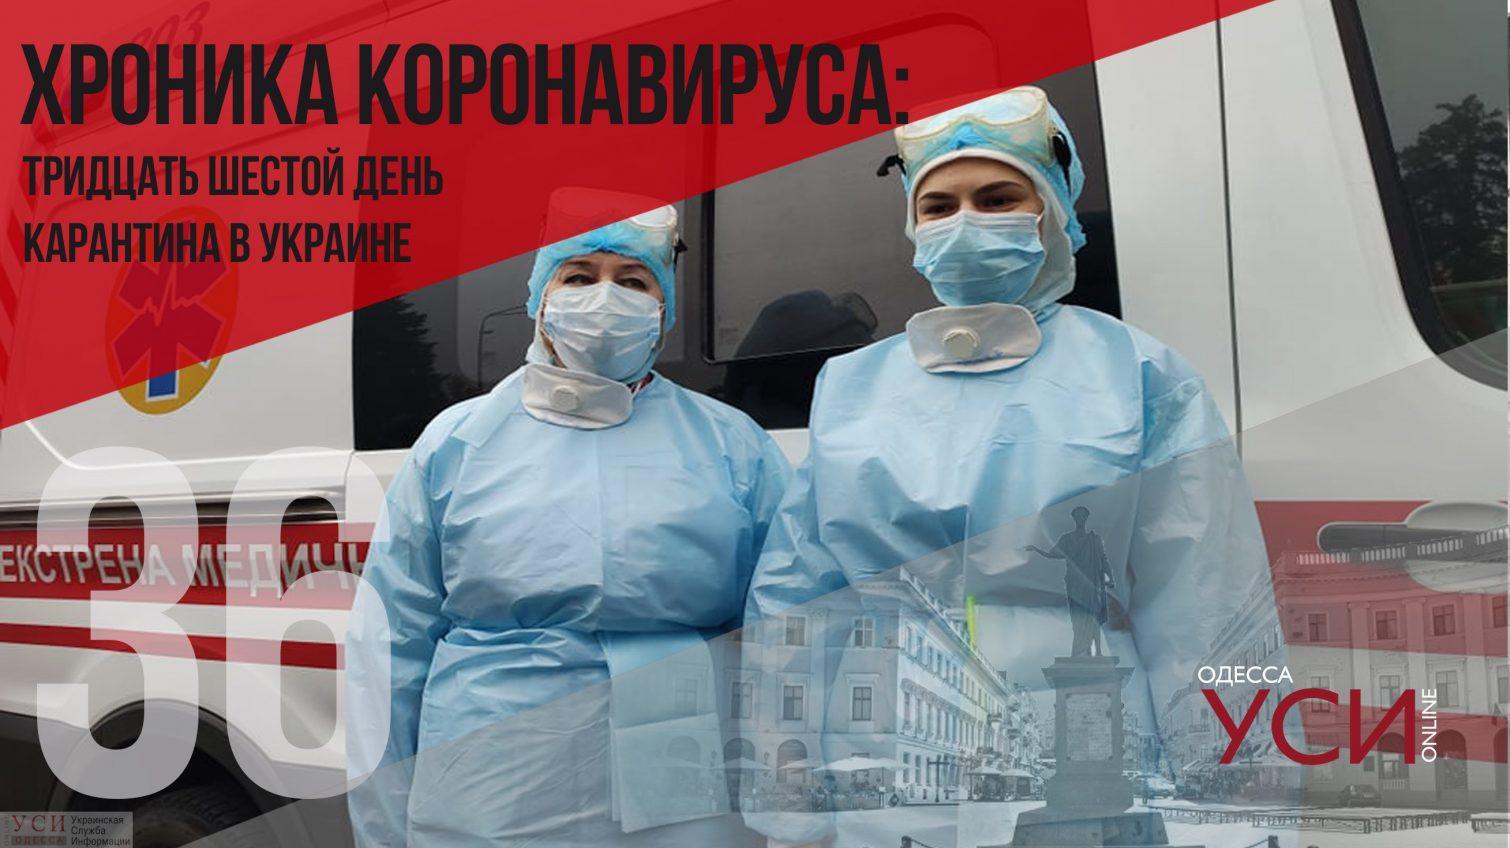 Хроника коронавируса: 36 дней с начала карантина в Украине ОБНОВЛЯЕТСЯ «фото»